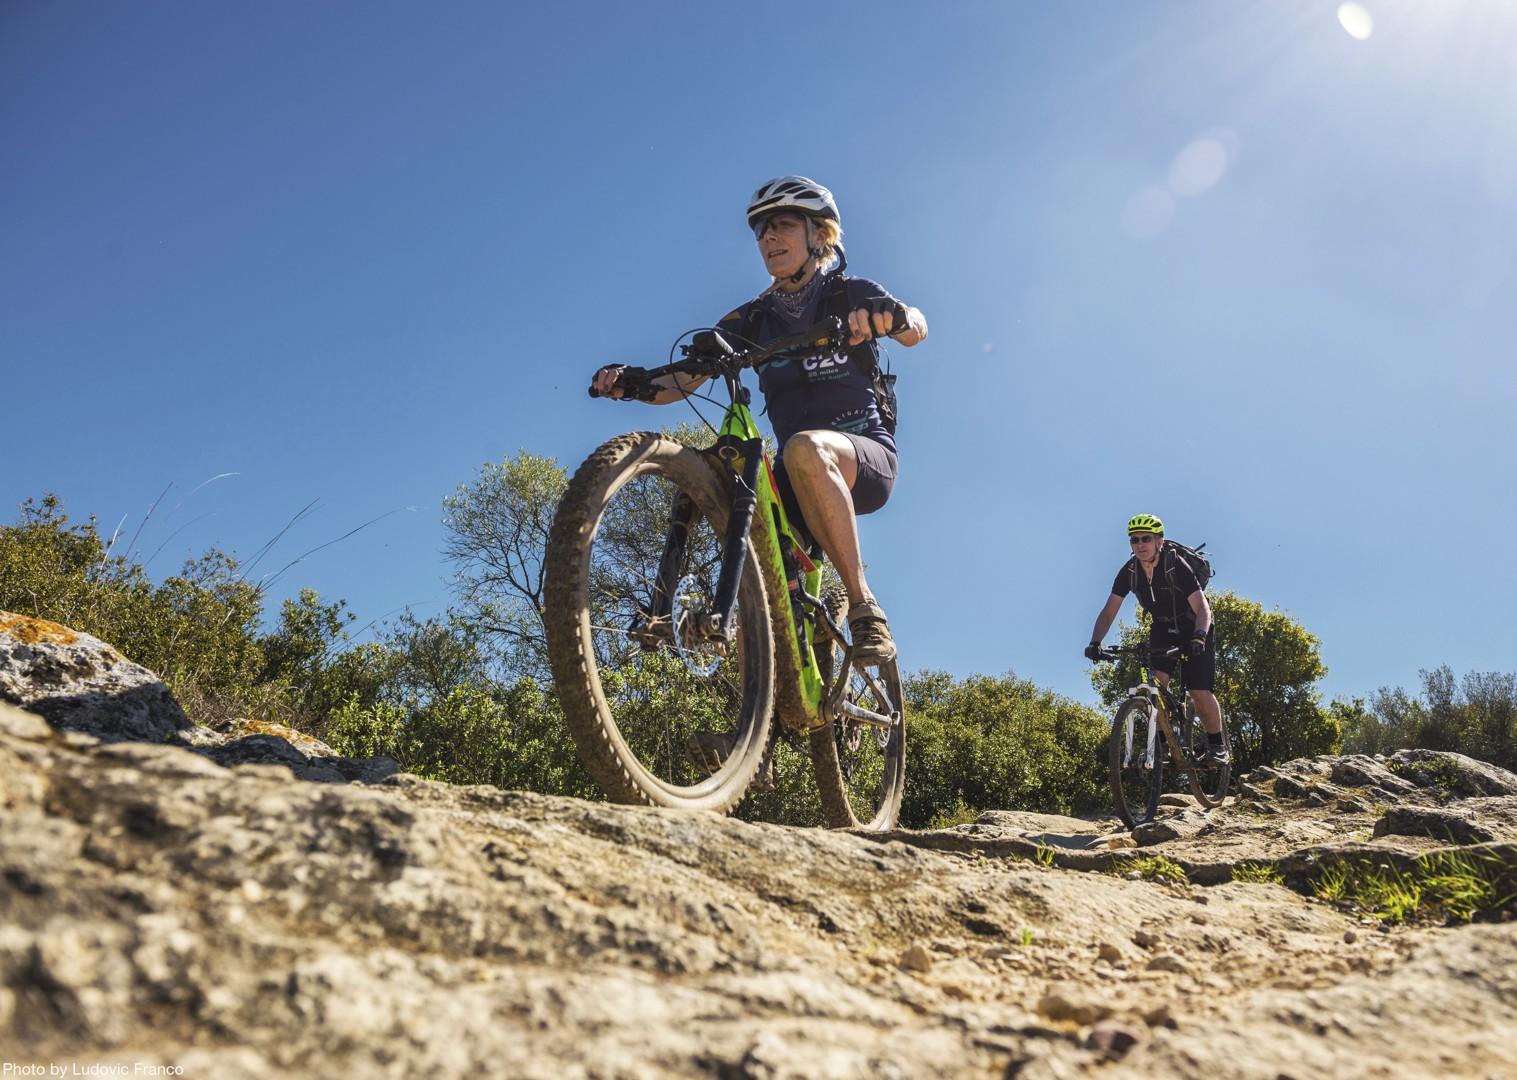 explore-mountain-biking-trip-atlantic-trails-portugal.jpg - Portugal - Atlantic Trails - Mountain Biking